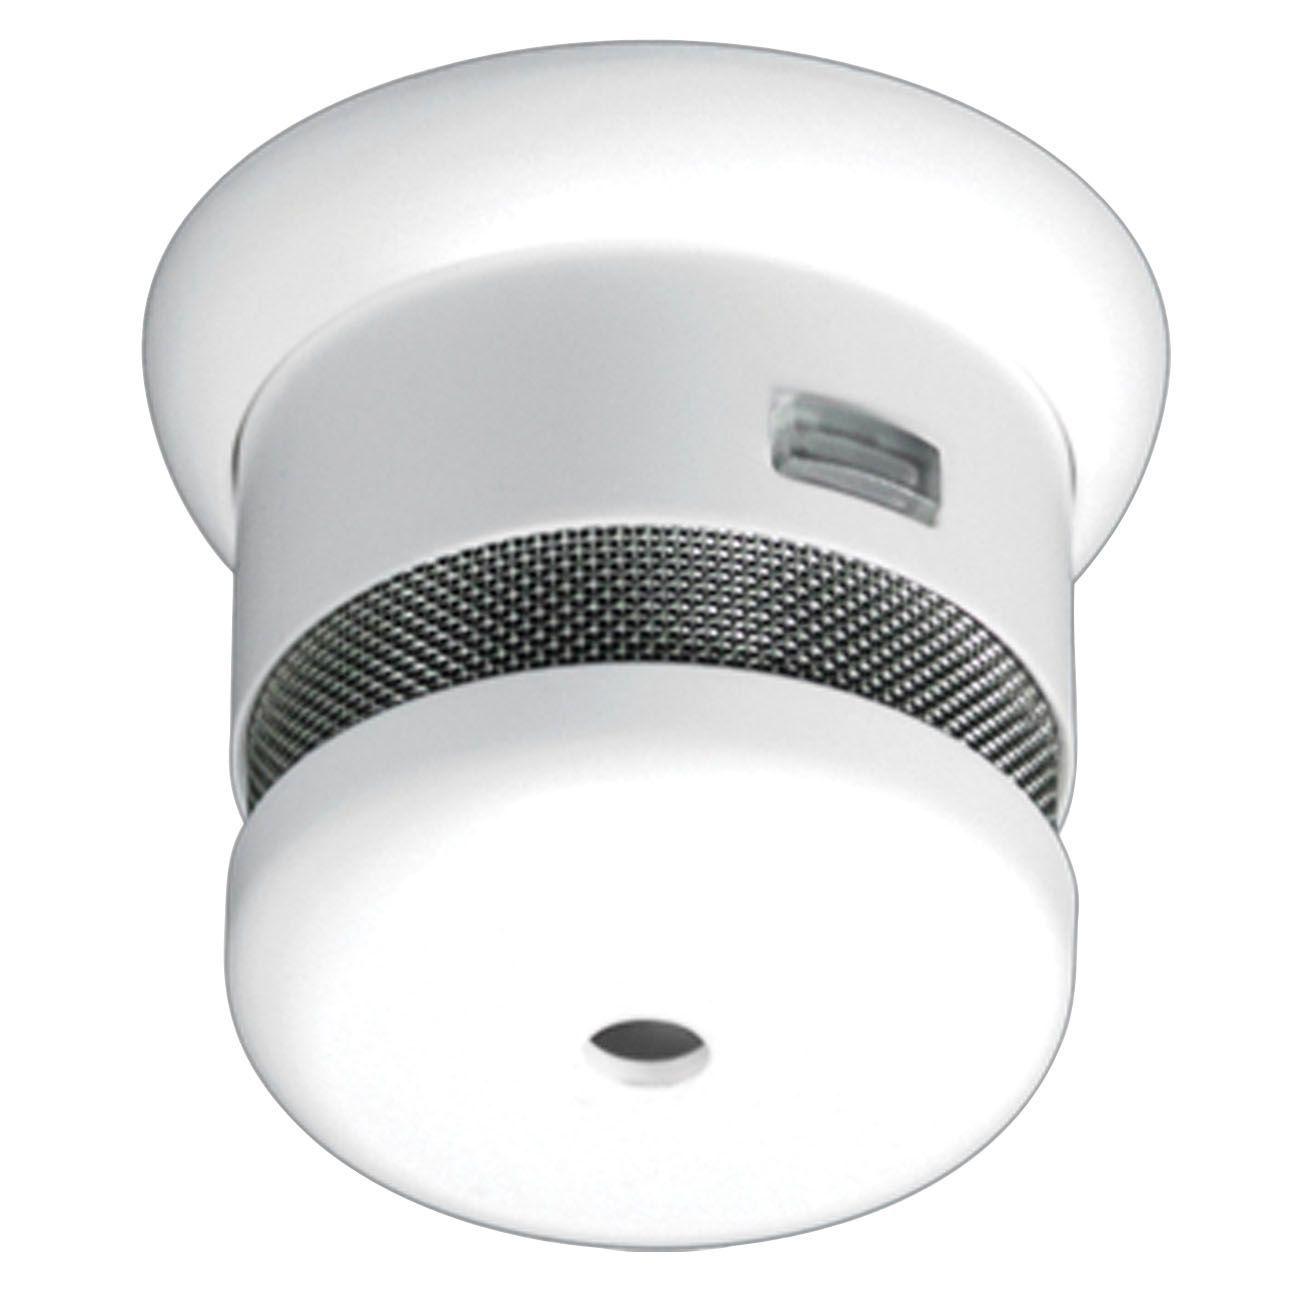 Fireangel Optical The Atom Smoke Alarm Departments Diy